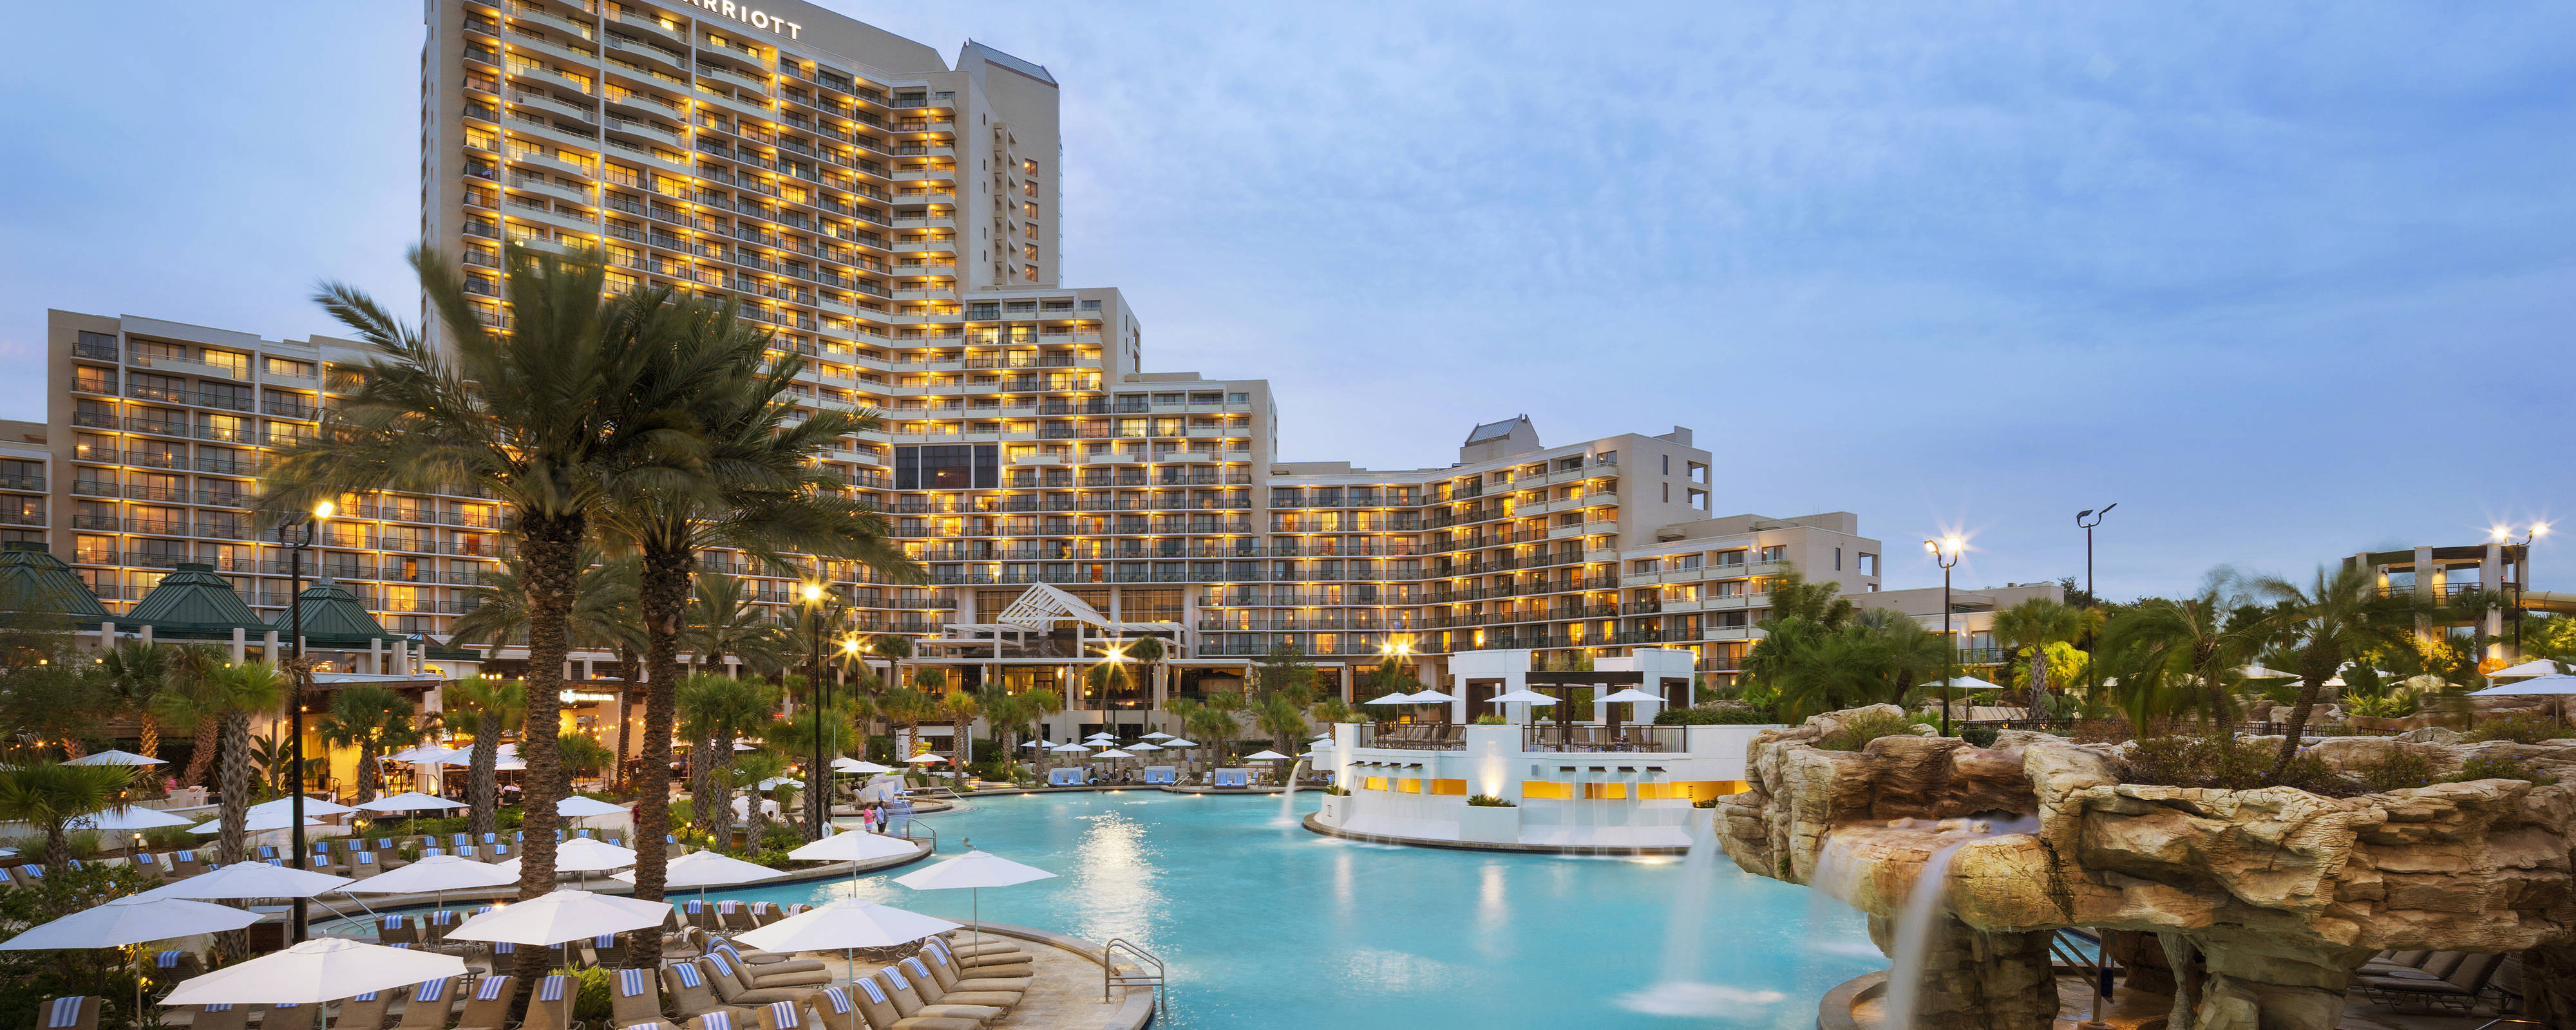 Resort Hotel In Orlando, Florida | Orlando World Center Marriott - Map Of Hotels In Orlando Florida